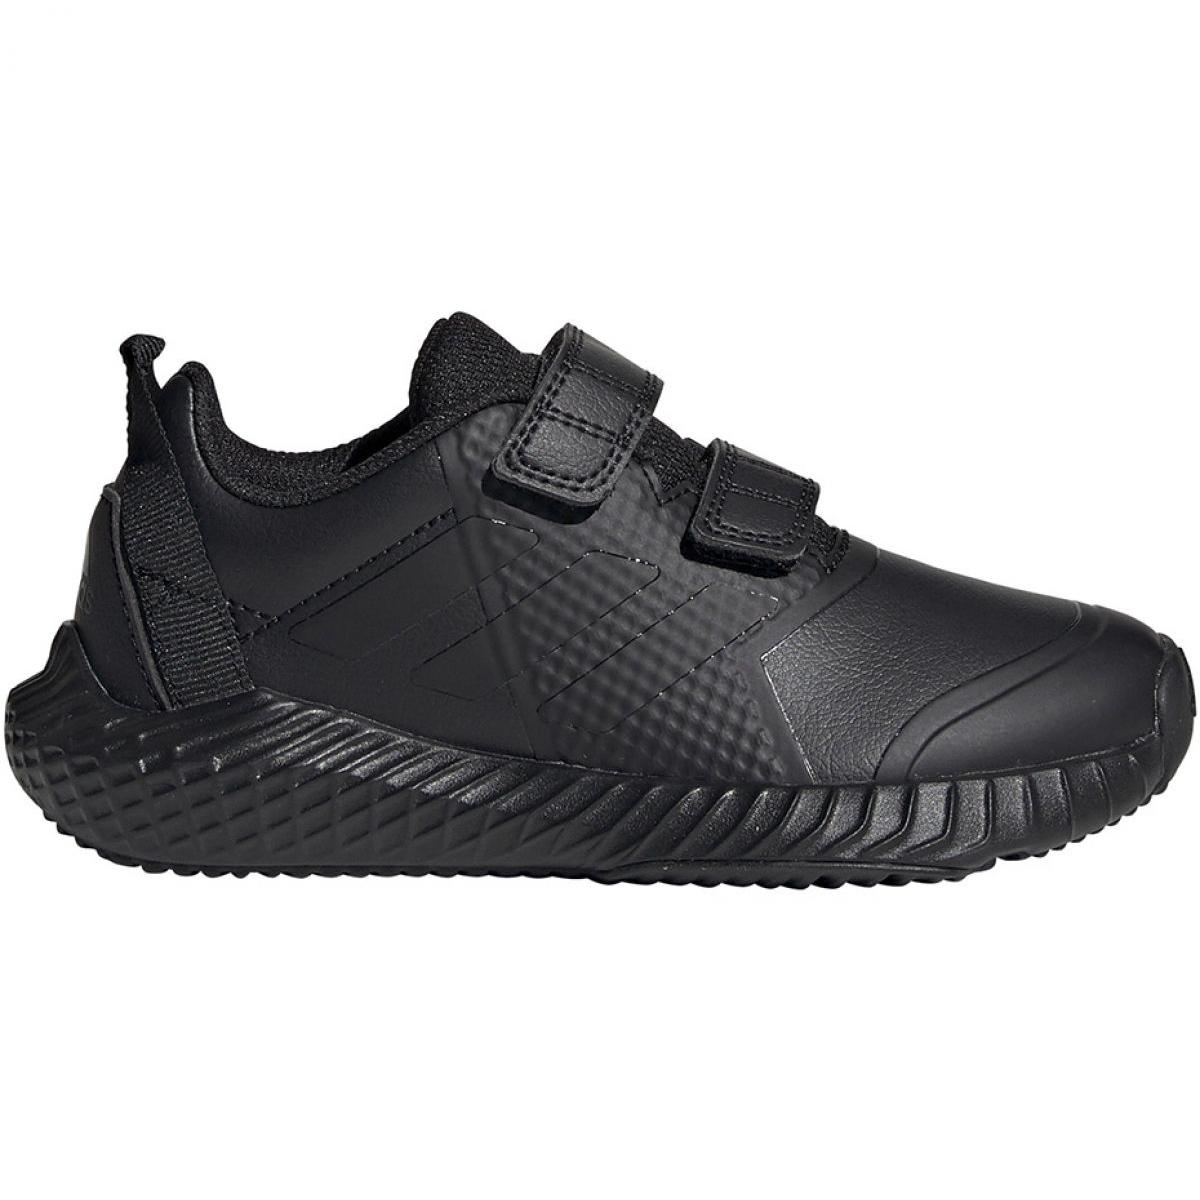 Adidas sapatos FortaGym Cf K Jr G27203 preto